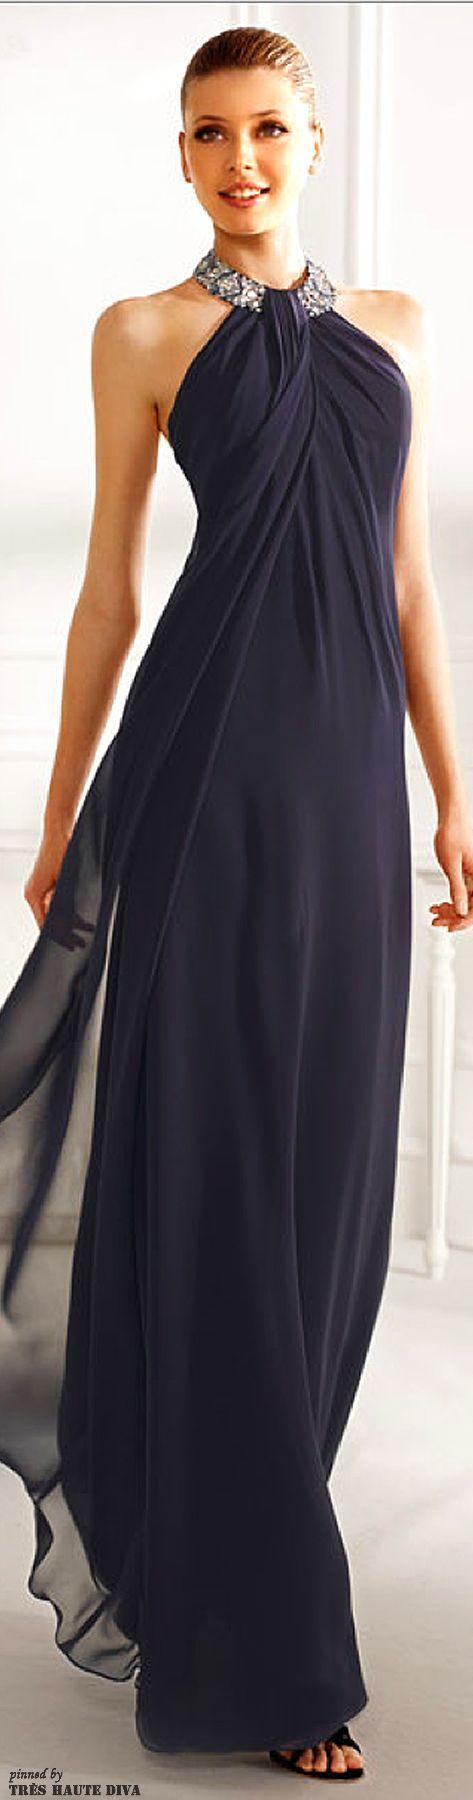 Vestidos vestidos pinterest couture black evening dresses and